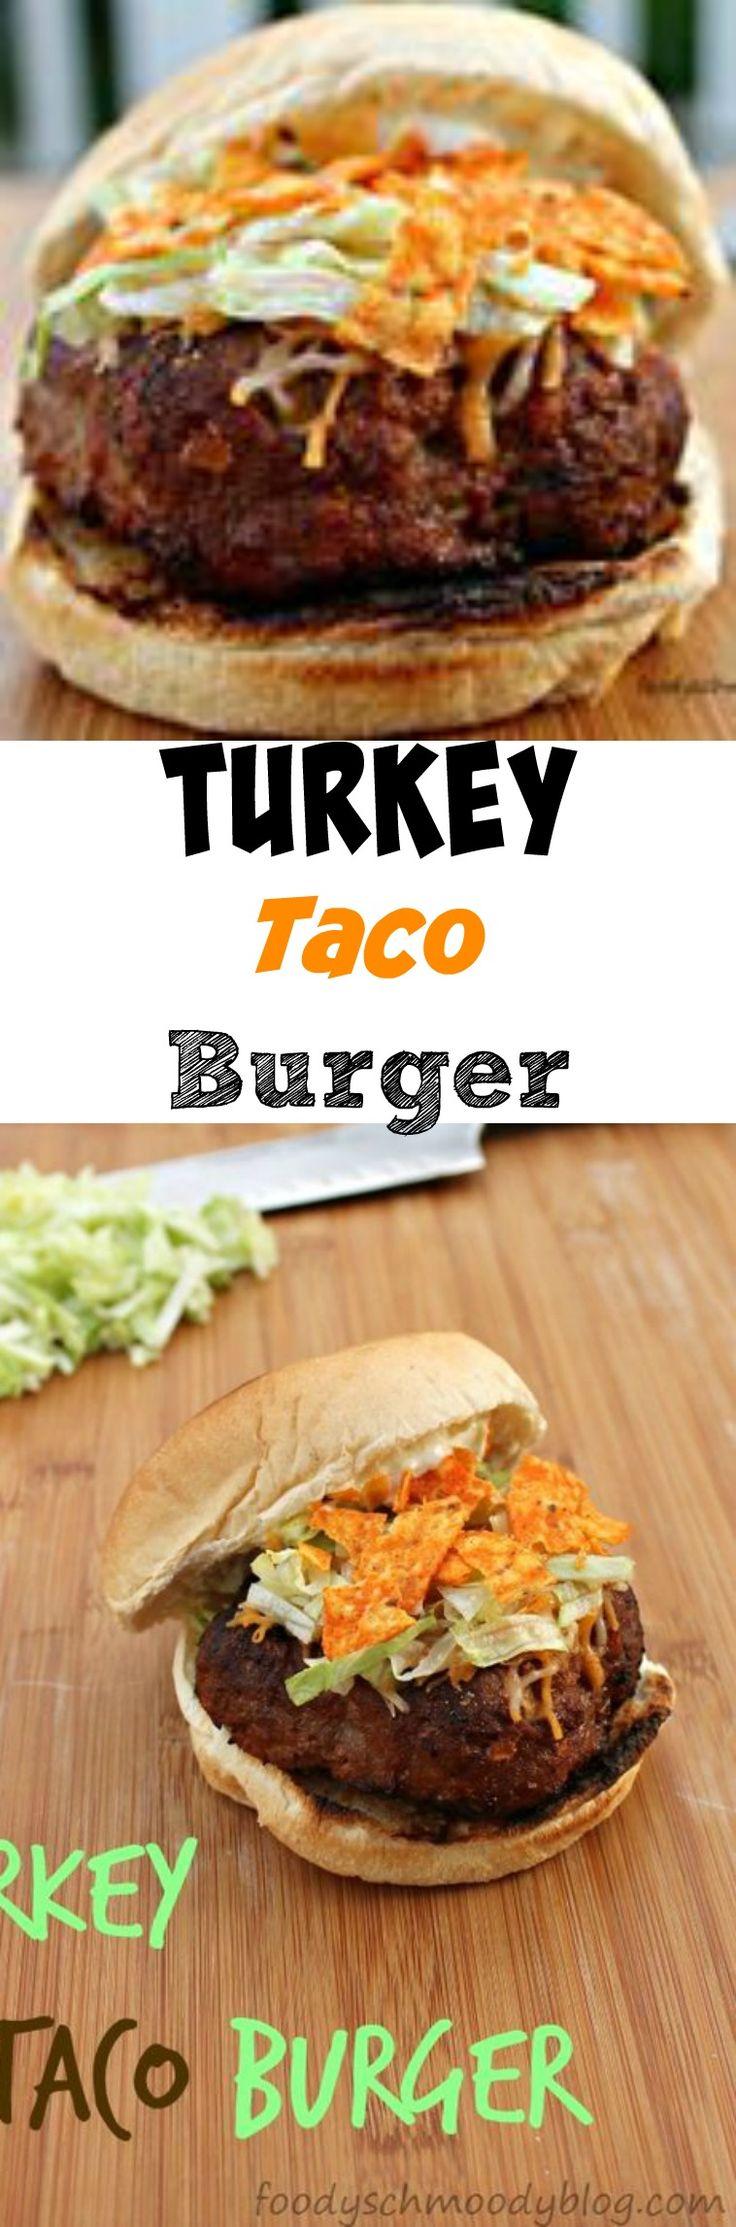 Turkey Taco Burger - Finally a turkey burger worth making! Lots of great flavor - totally kid friendly.